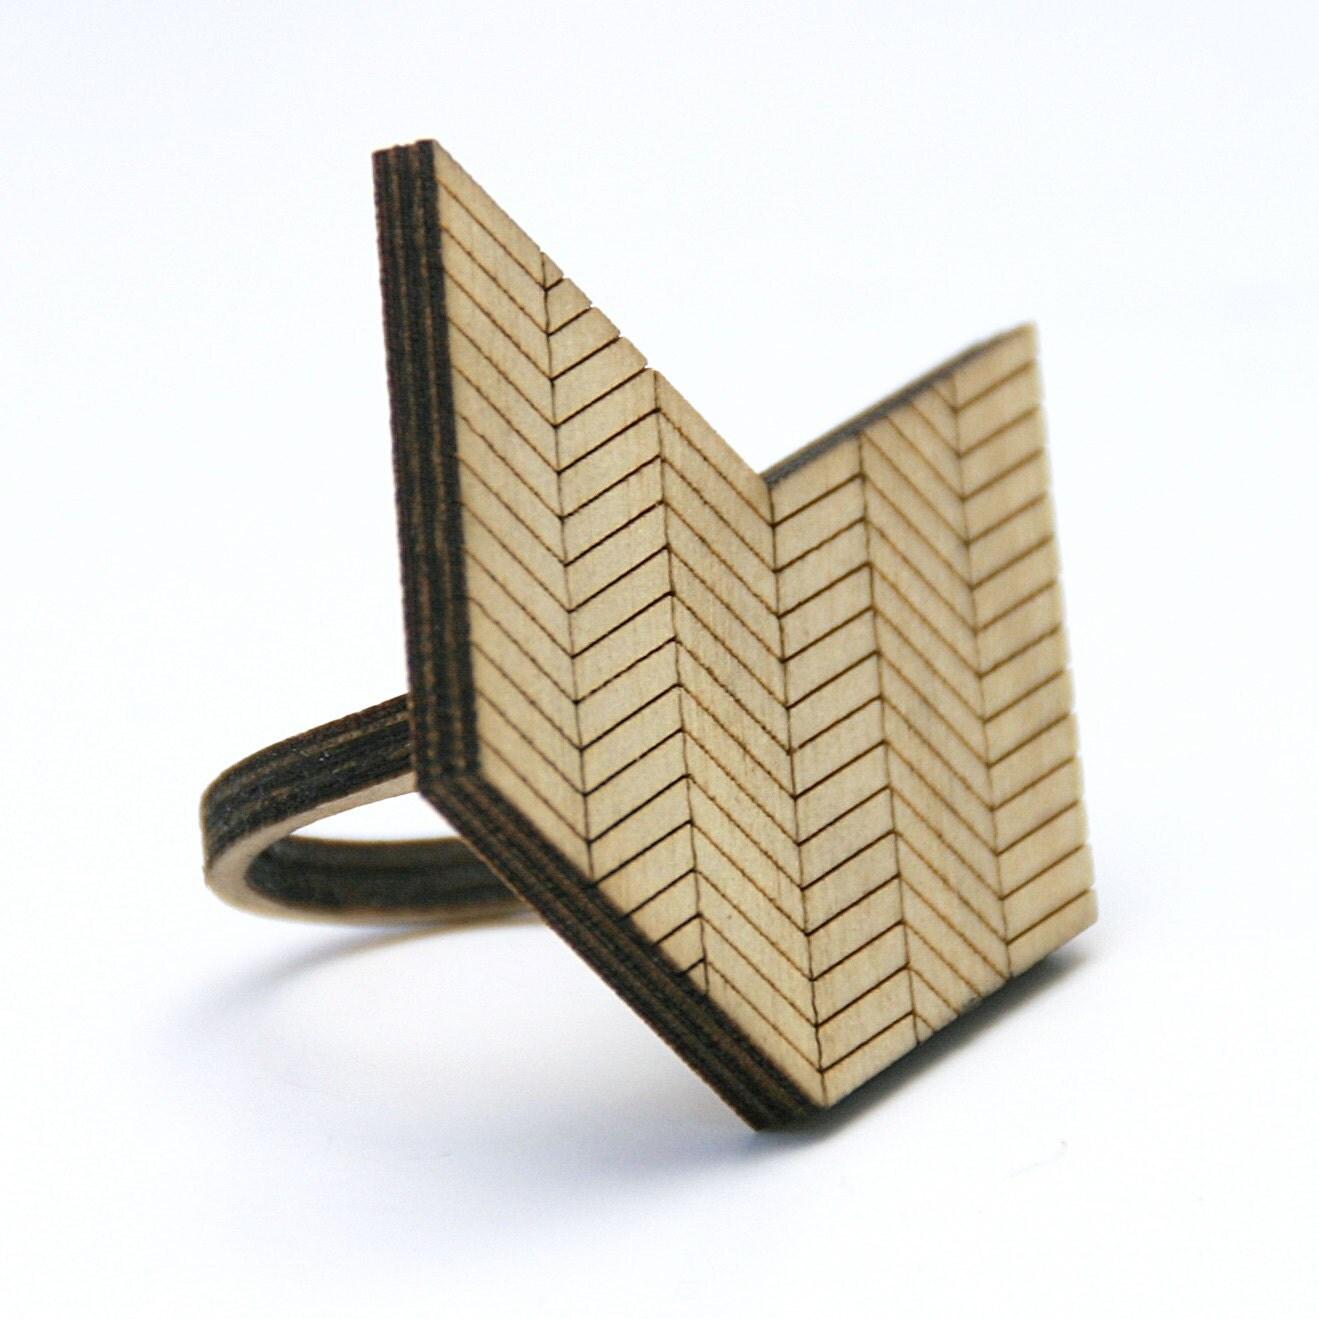 Chevron Wood Ring: Arrow or Chevron Geometric Design Made to Order in Any Size - DiamondsAreEvil